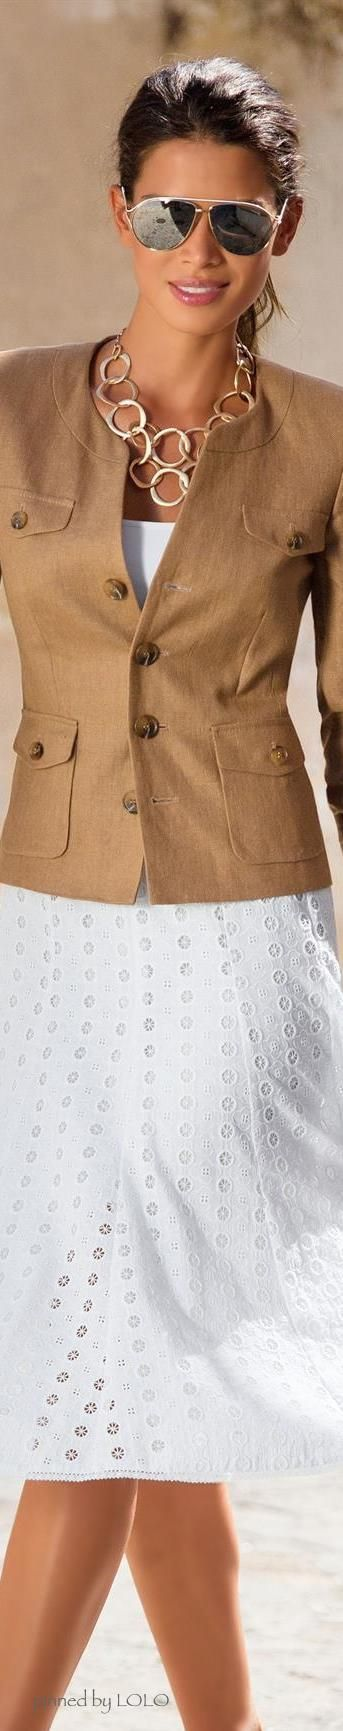 Madeleine camel blazer @roressclothes closet ideas #women fashion outfit #clothing style apparel